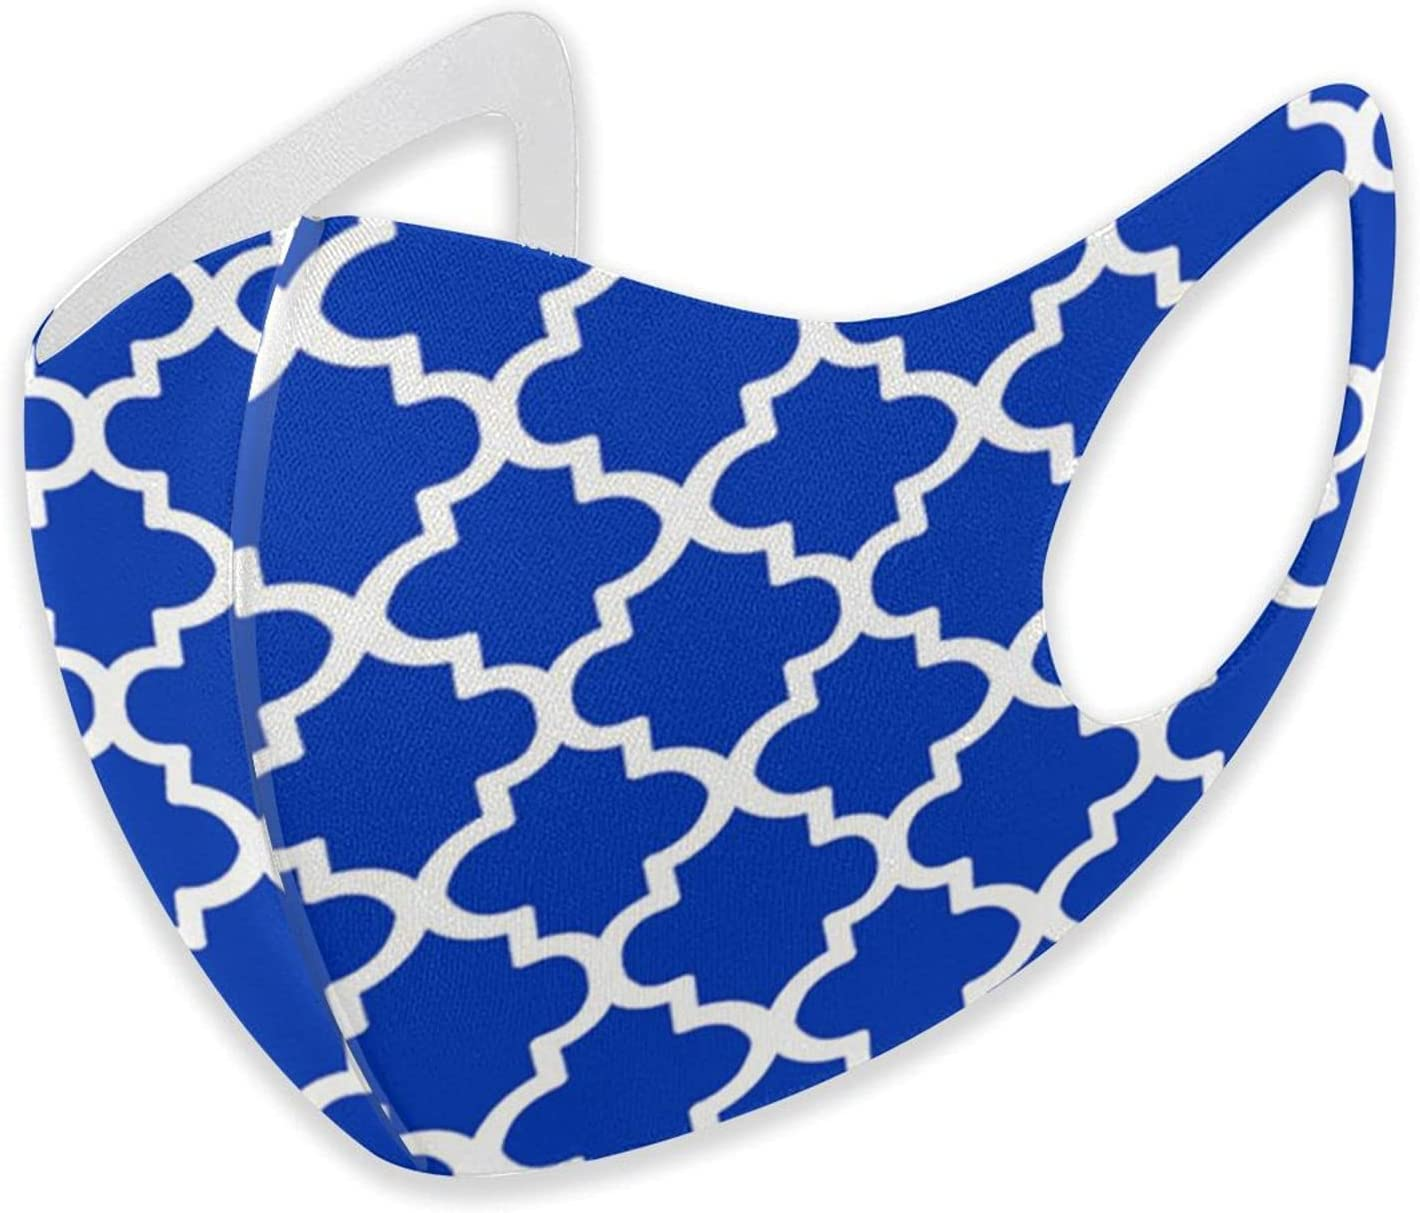 Face Mask Protect Cover Bandana Scarf Unisex Translated Washable Reusable Overseas parallel import regular item F